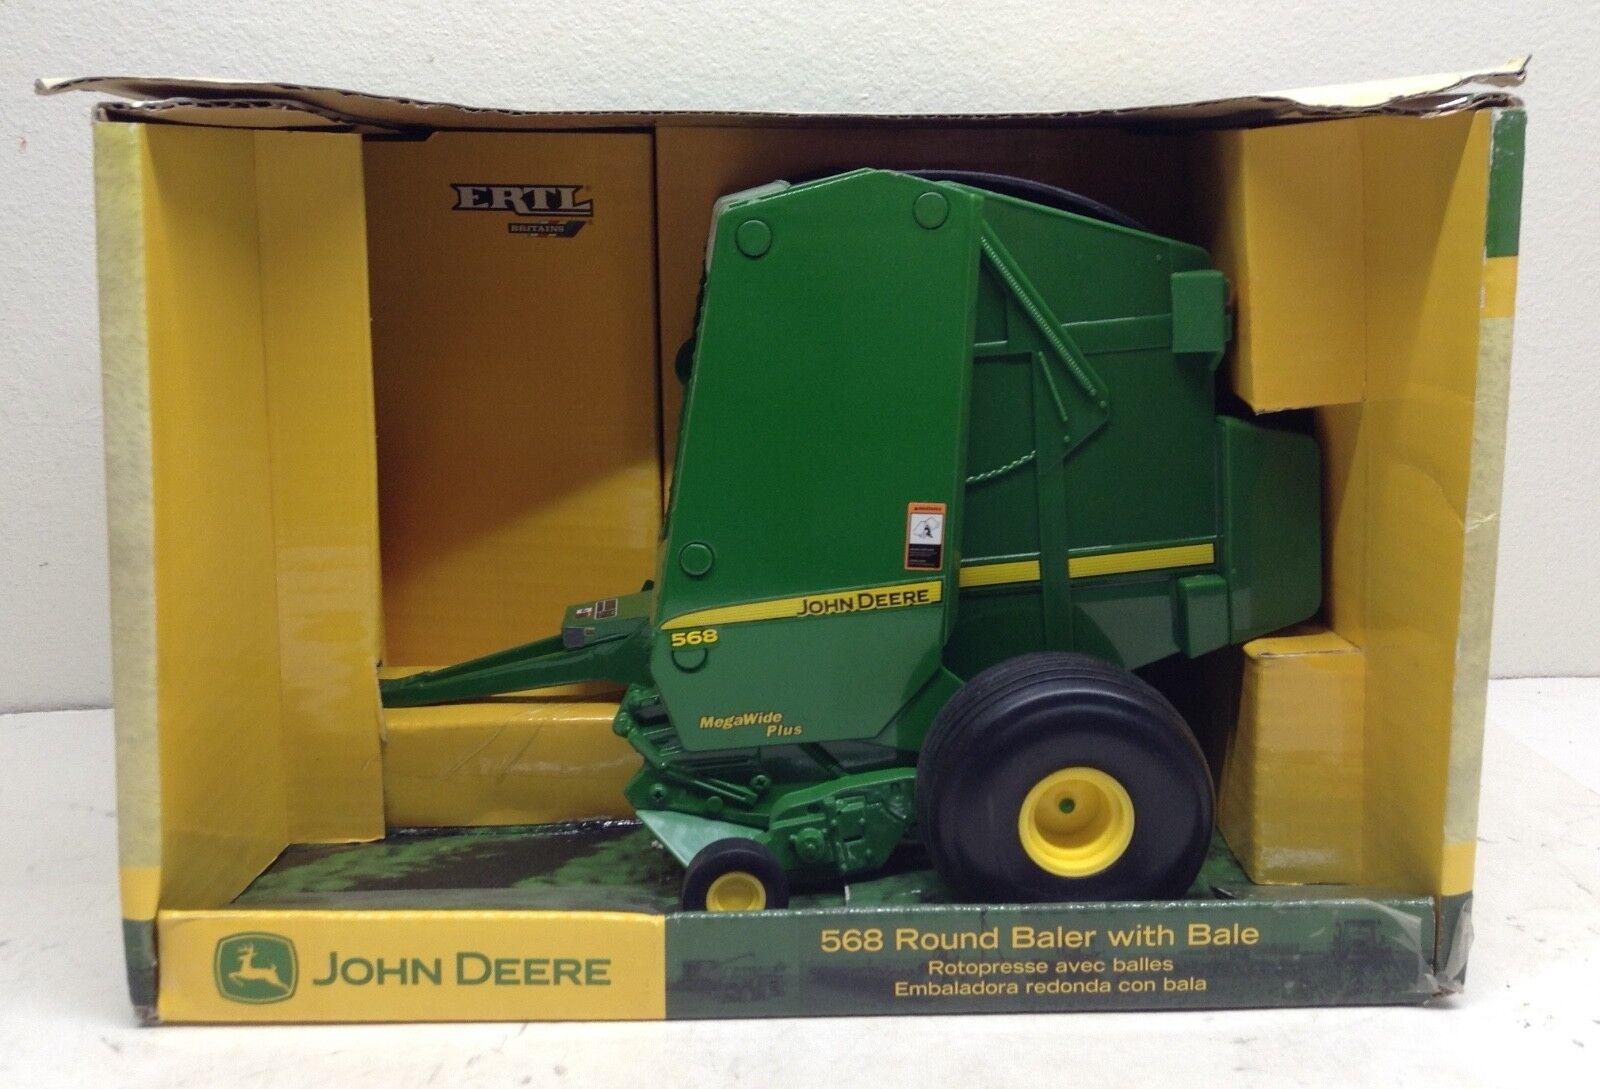 1 16 John Deere 568 Round Baler w  Bale Tractor ImpleSiet New in Box by ERTL